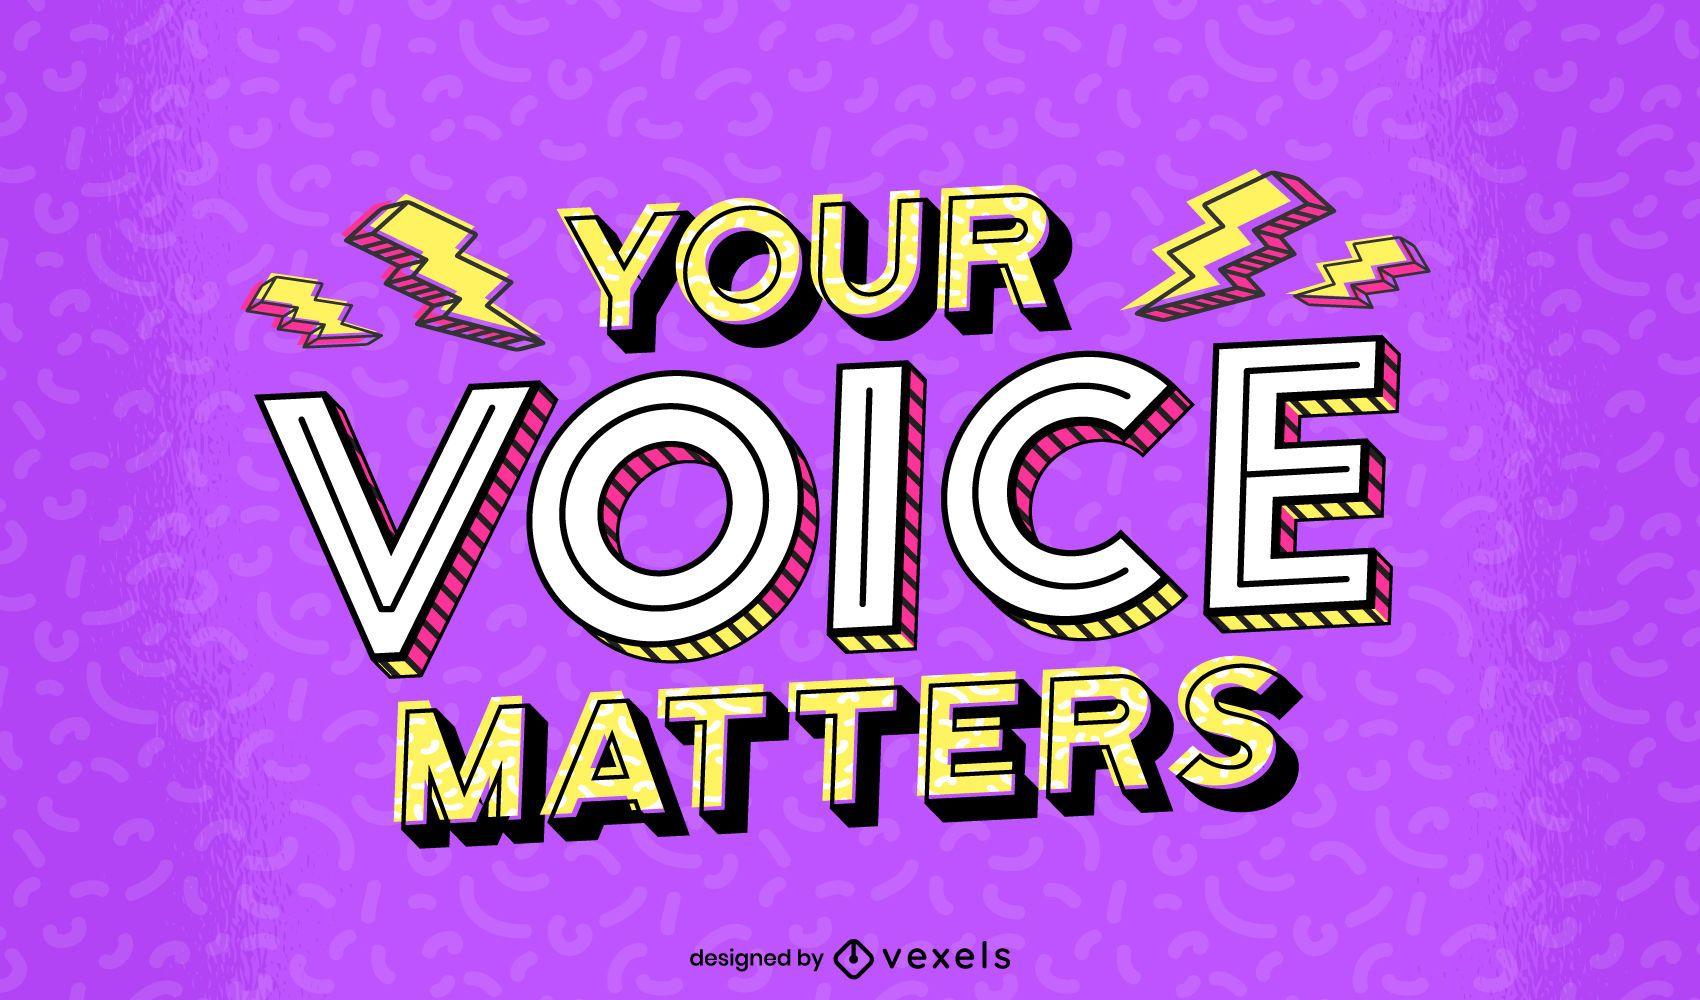 Sua voz importa design de letras